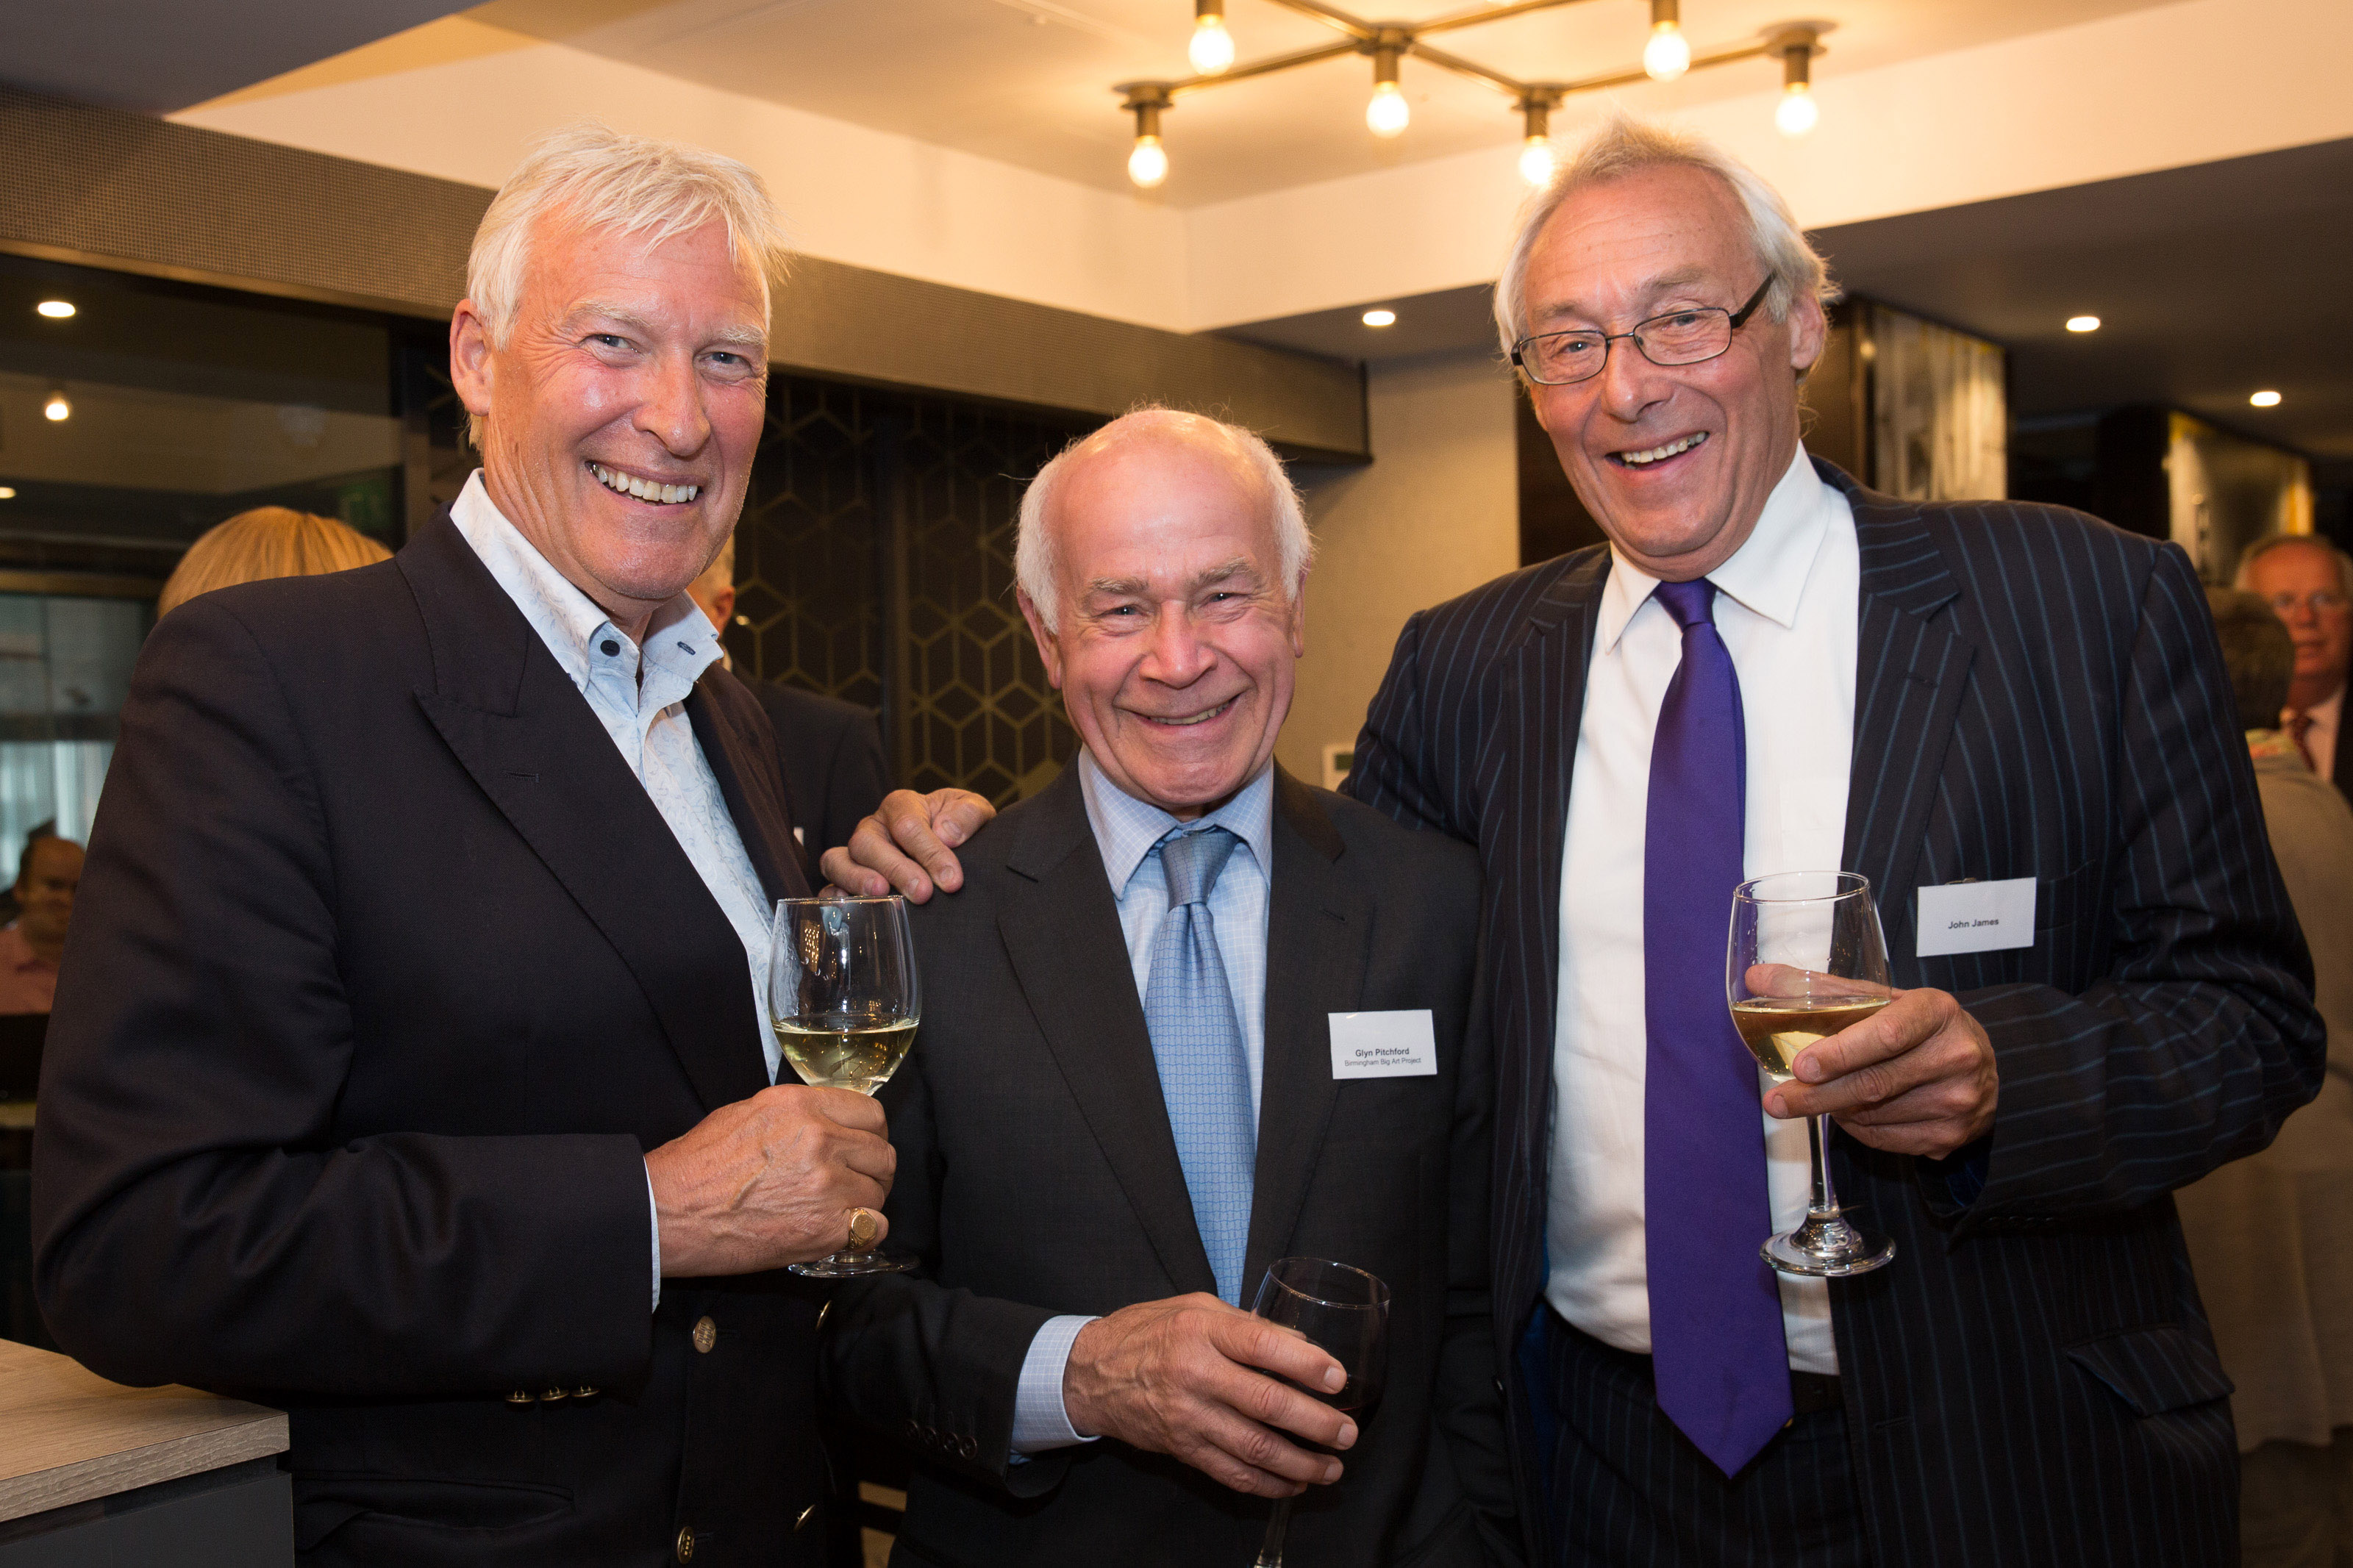 Pictured from left, Derek Inman, Glyn Pitchford, John James.